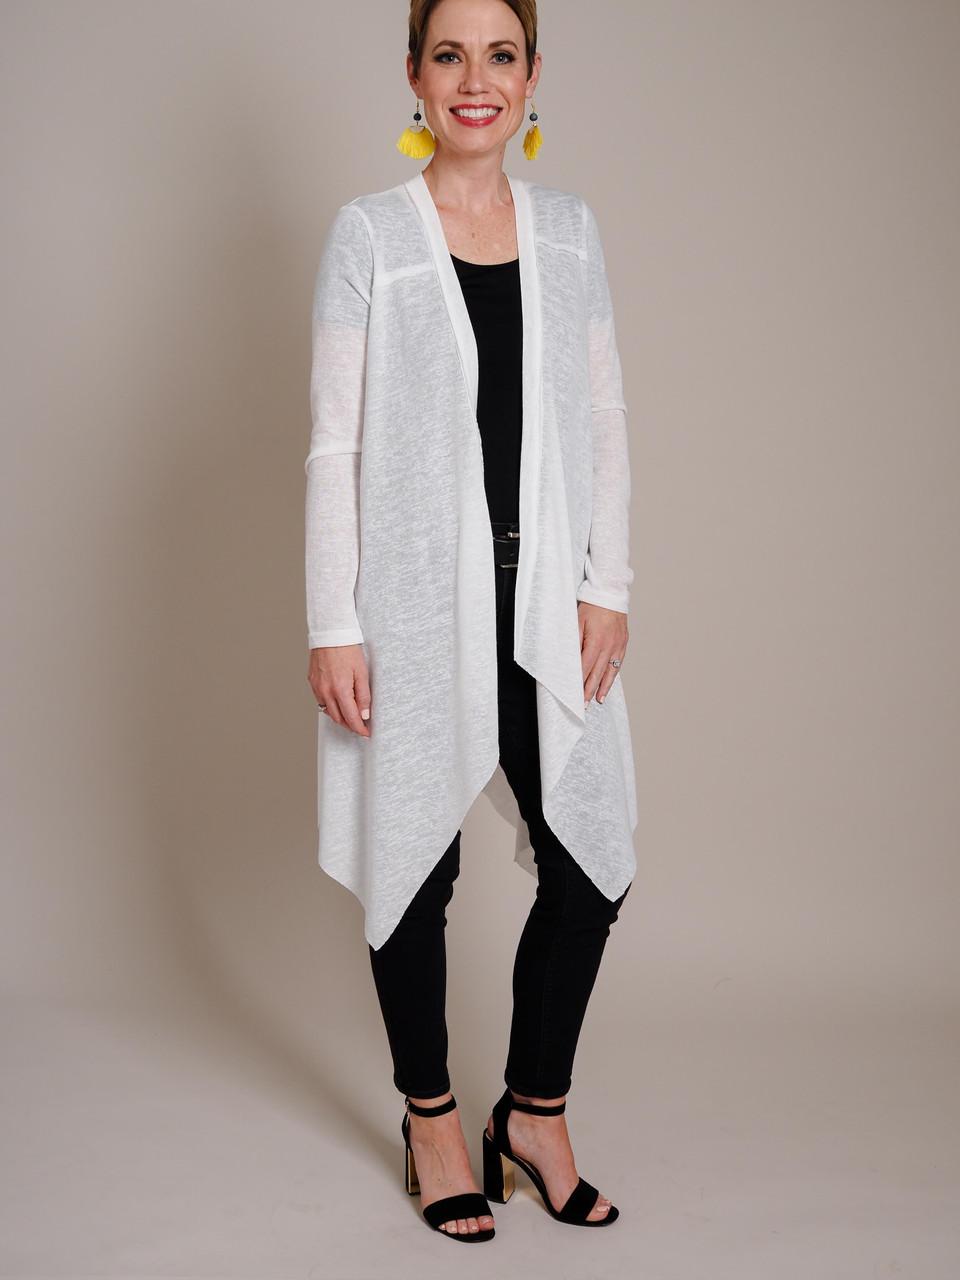 White Cardigan with Asymmetrical Hem